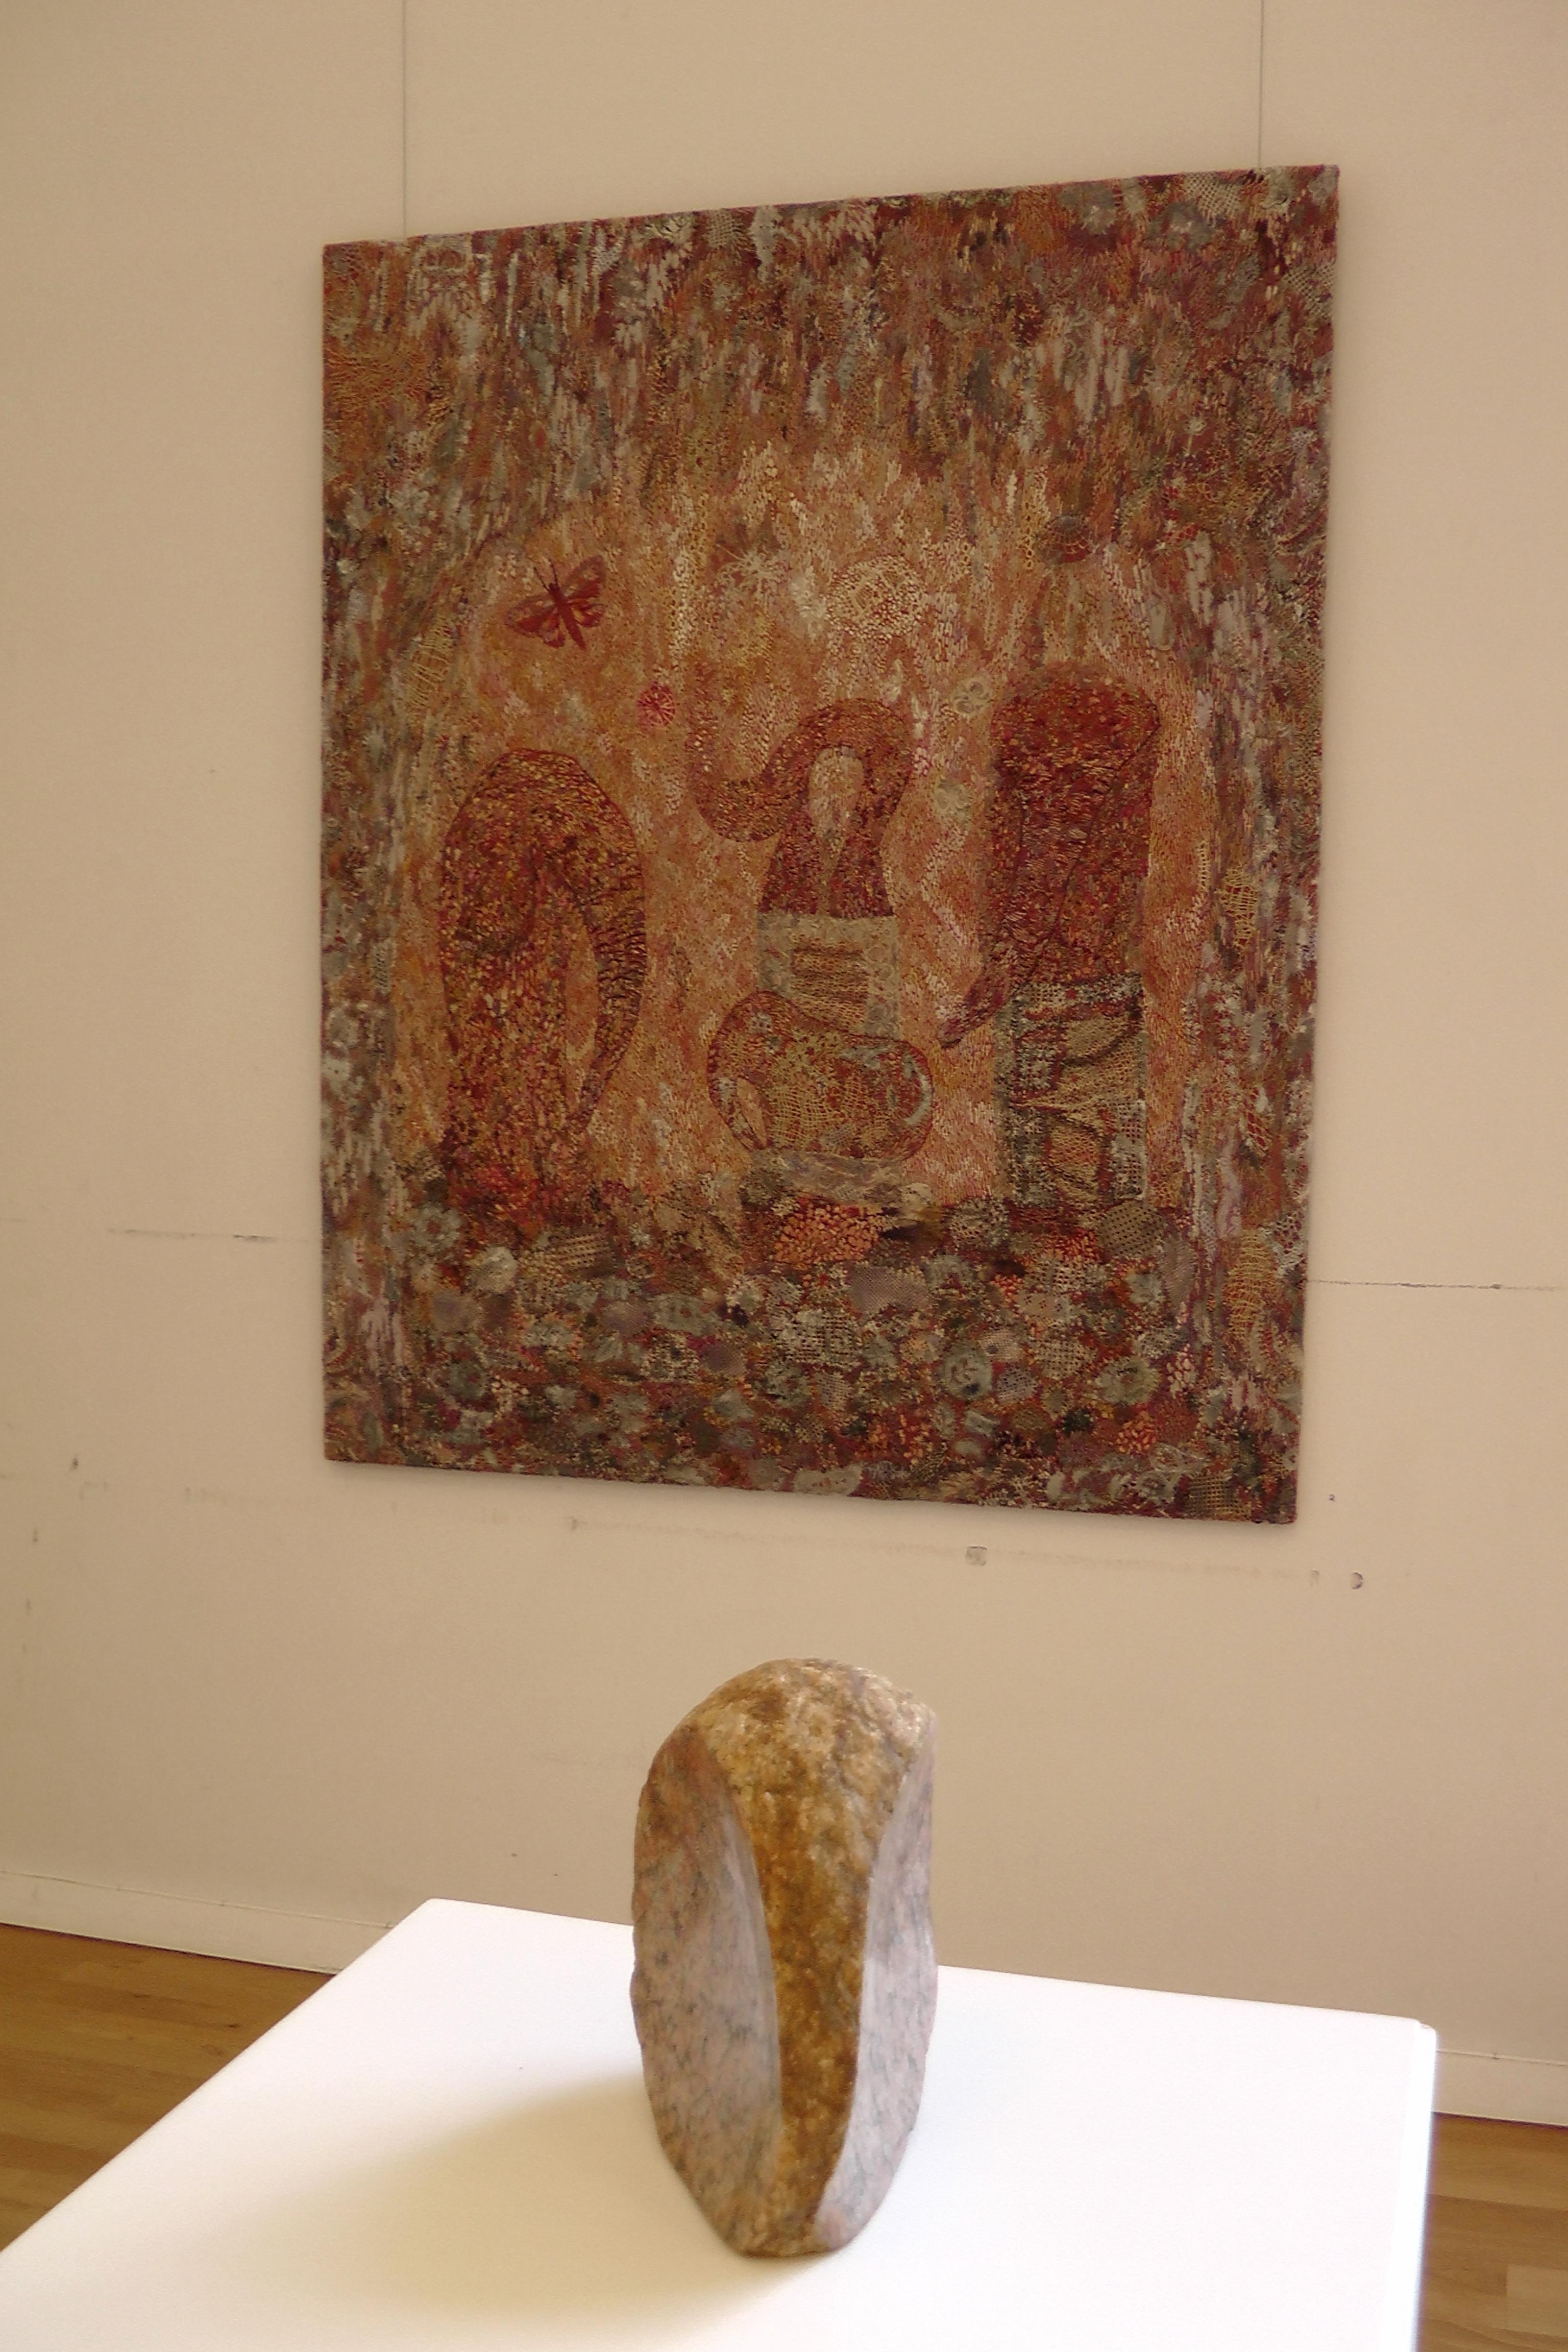 Udstilling / Exhibition